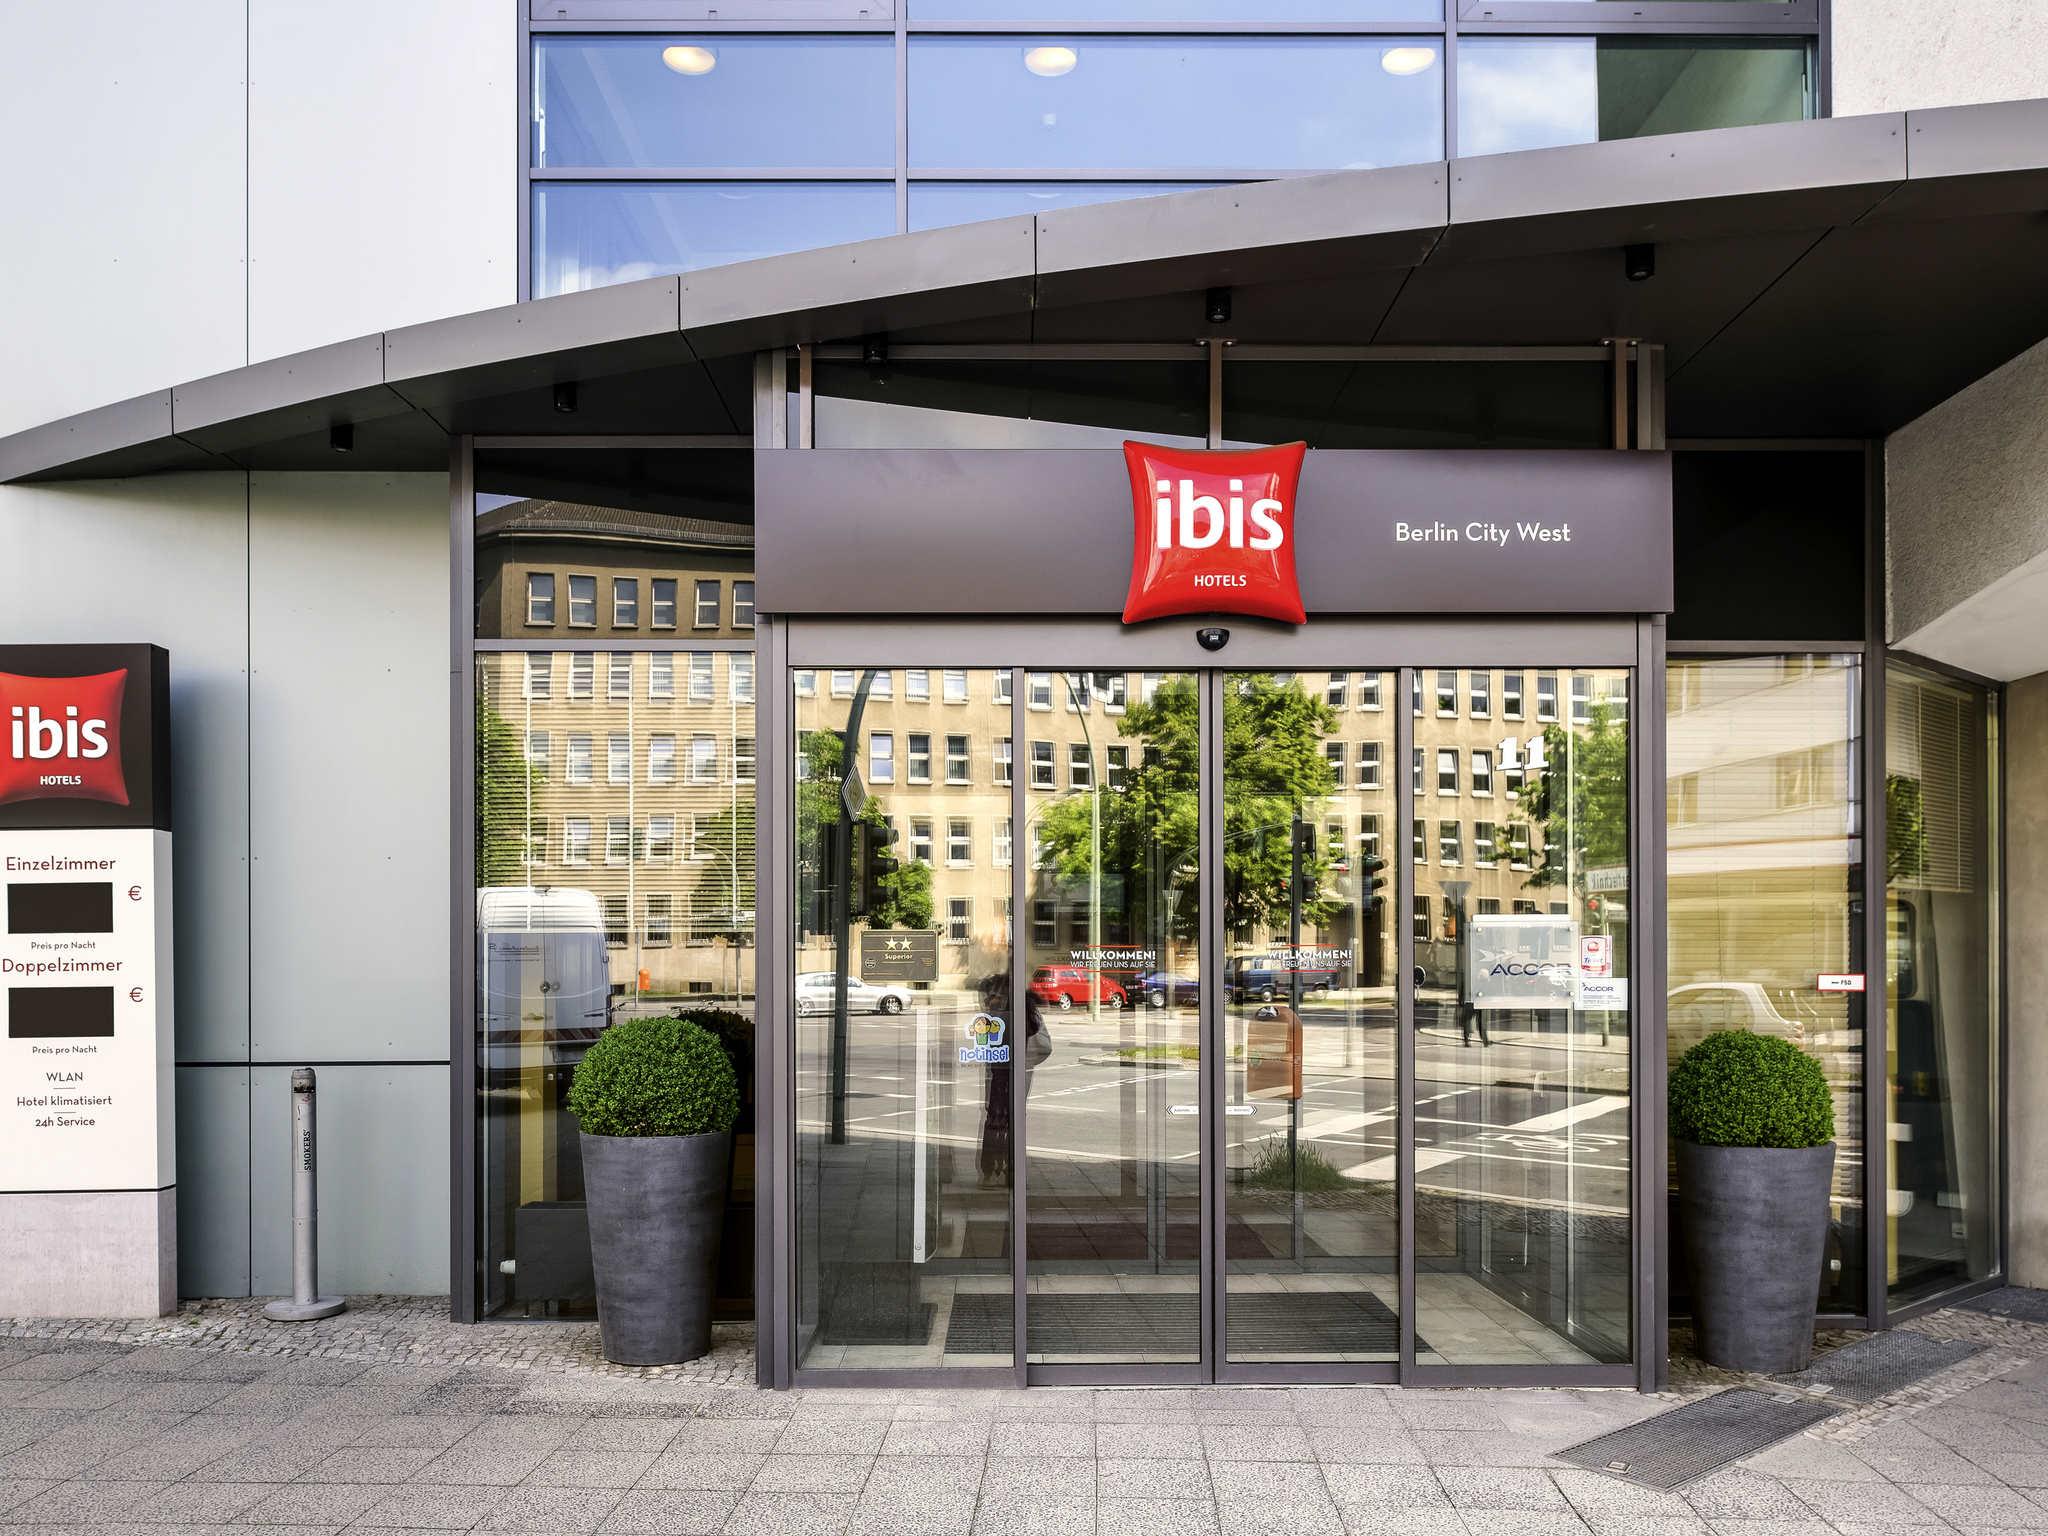 فندق - إيبيس ibis برلين سيتي ويست